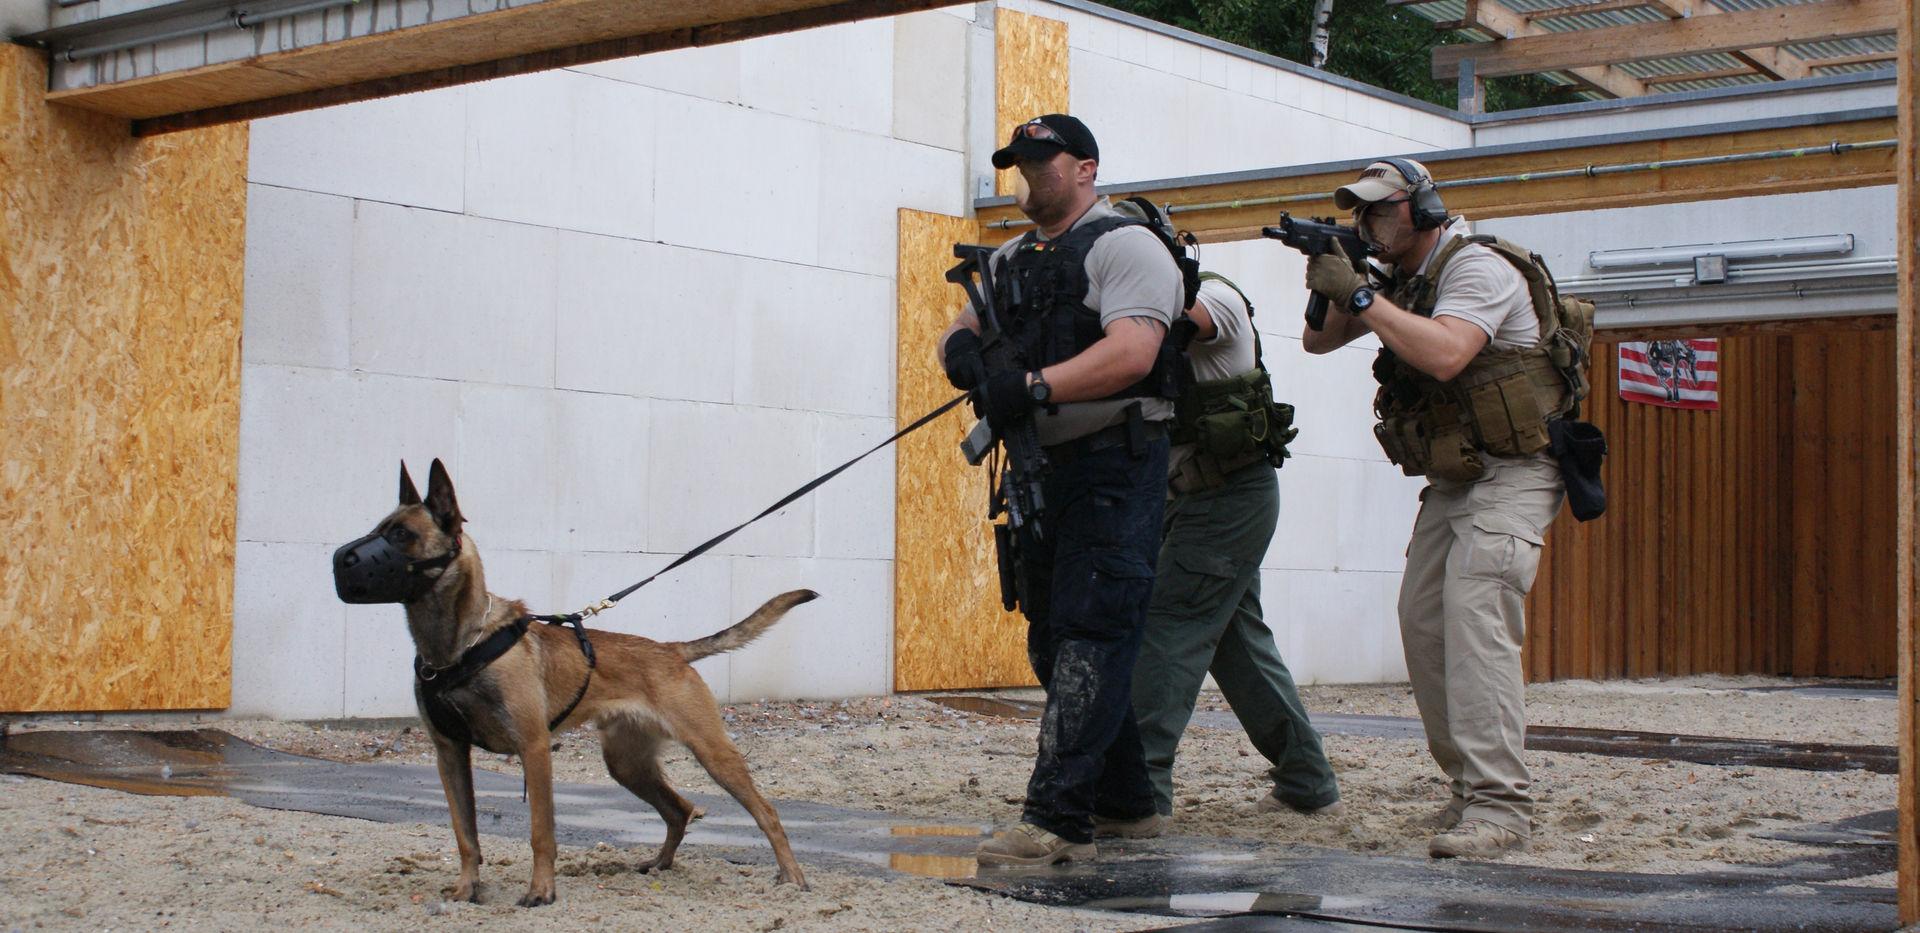 Erste Hilfe für Hundeführer